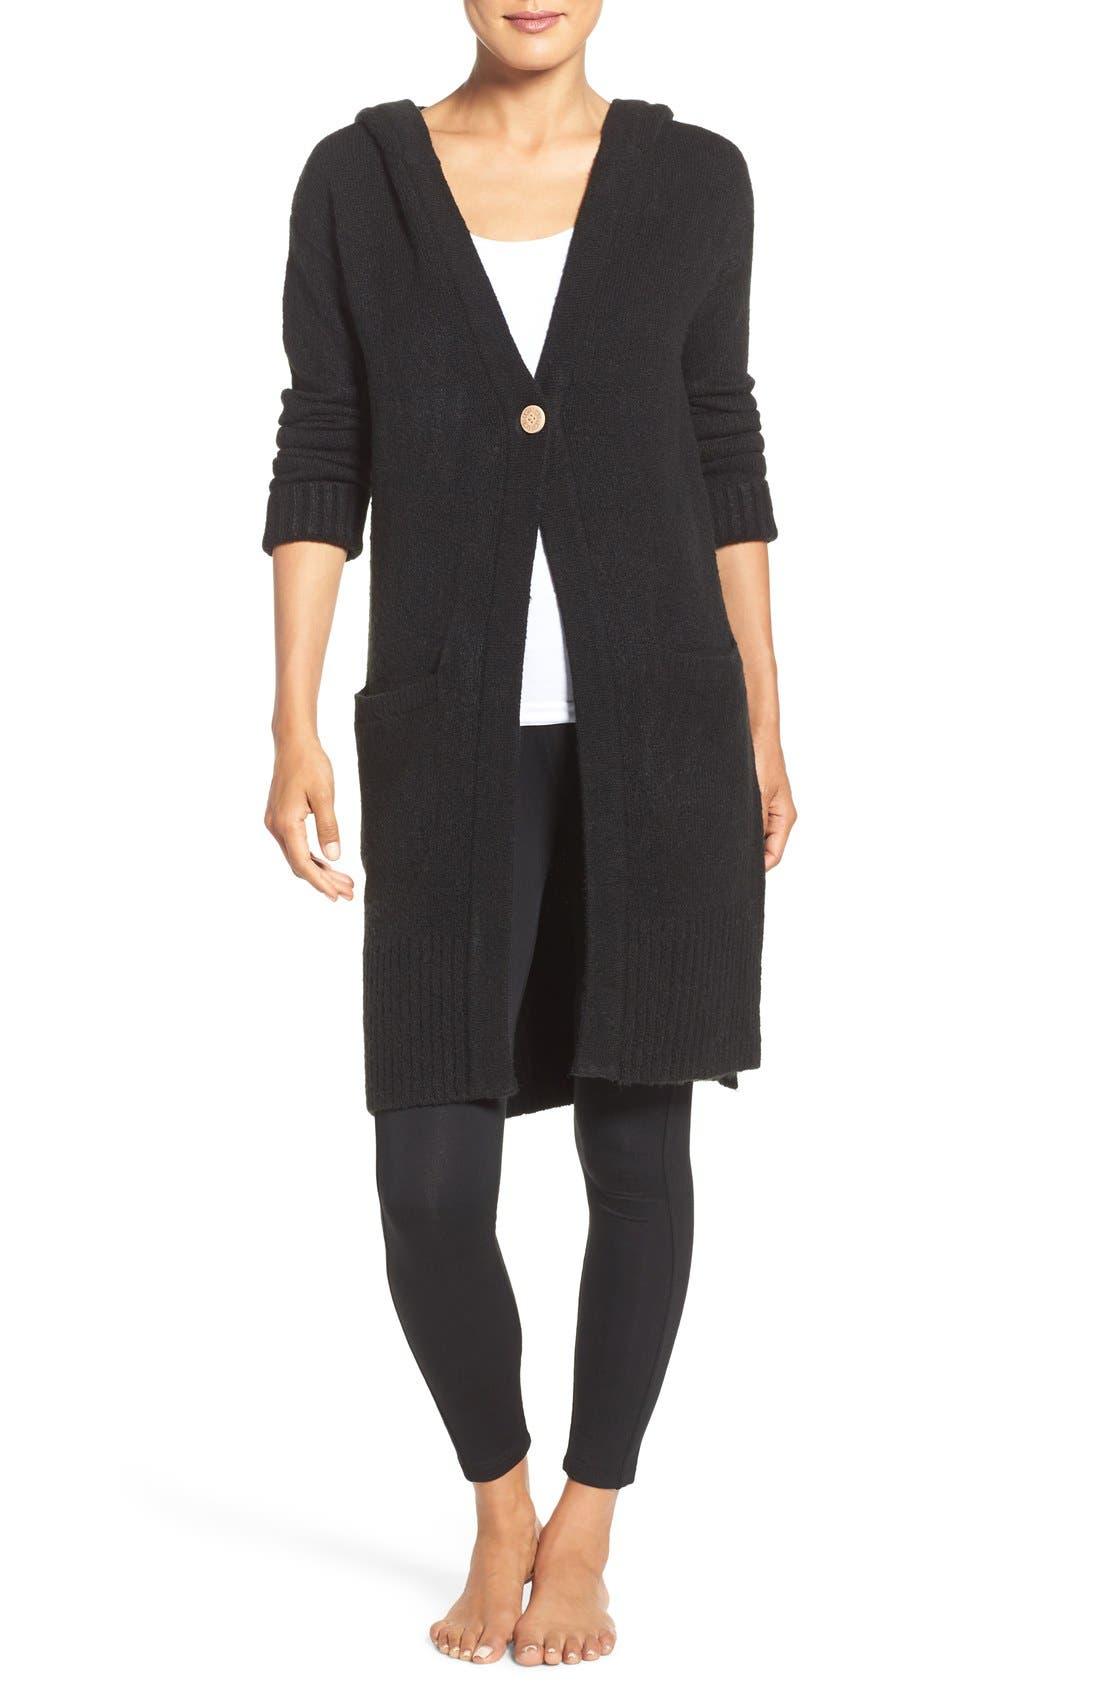 Main Image - UGG® 'Judith' Hooded Knit Cardigan